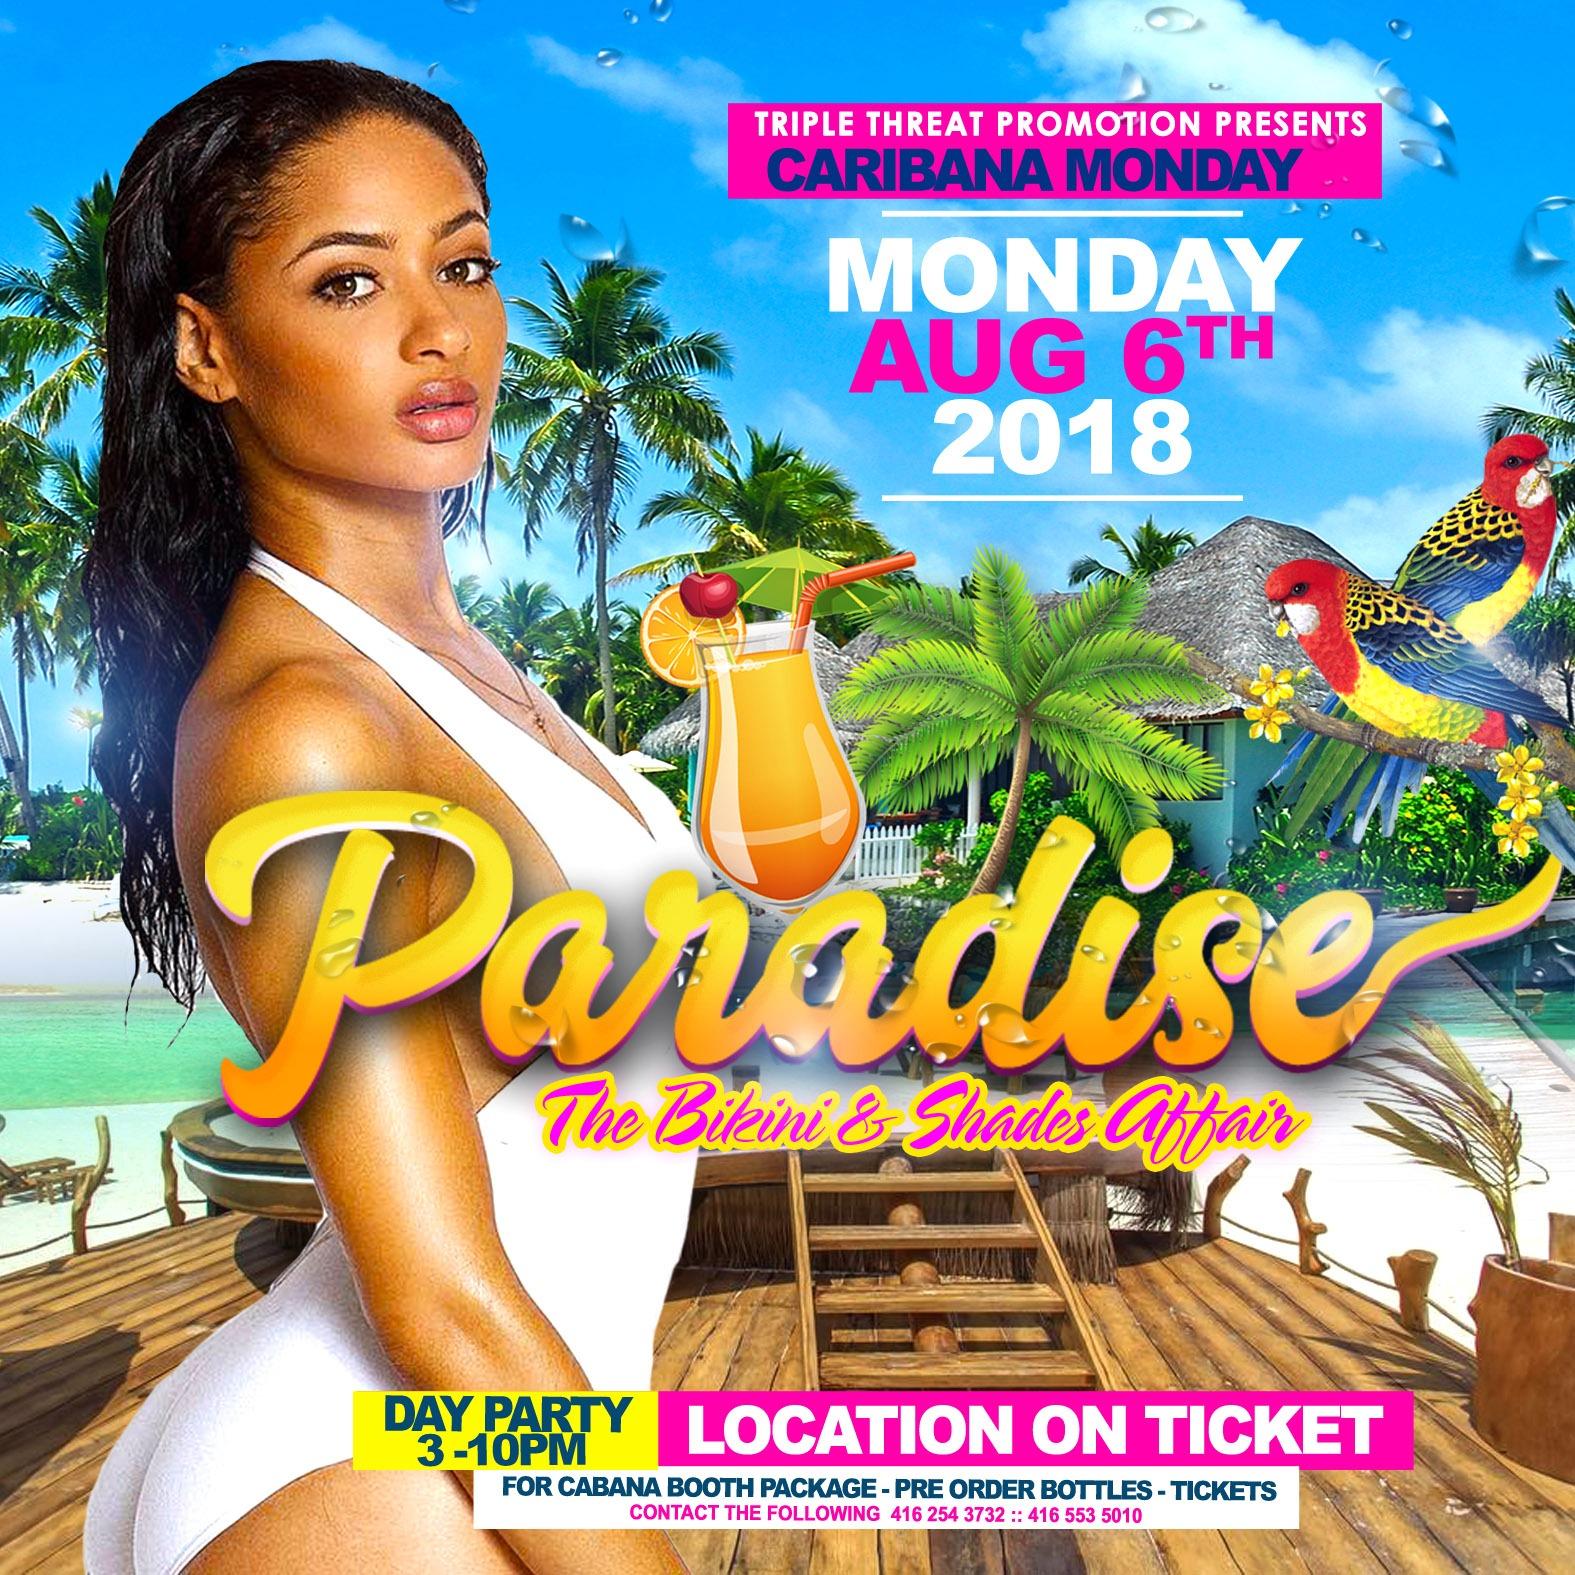 Paradise - The Bikini and Shades After